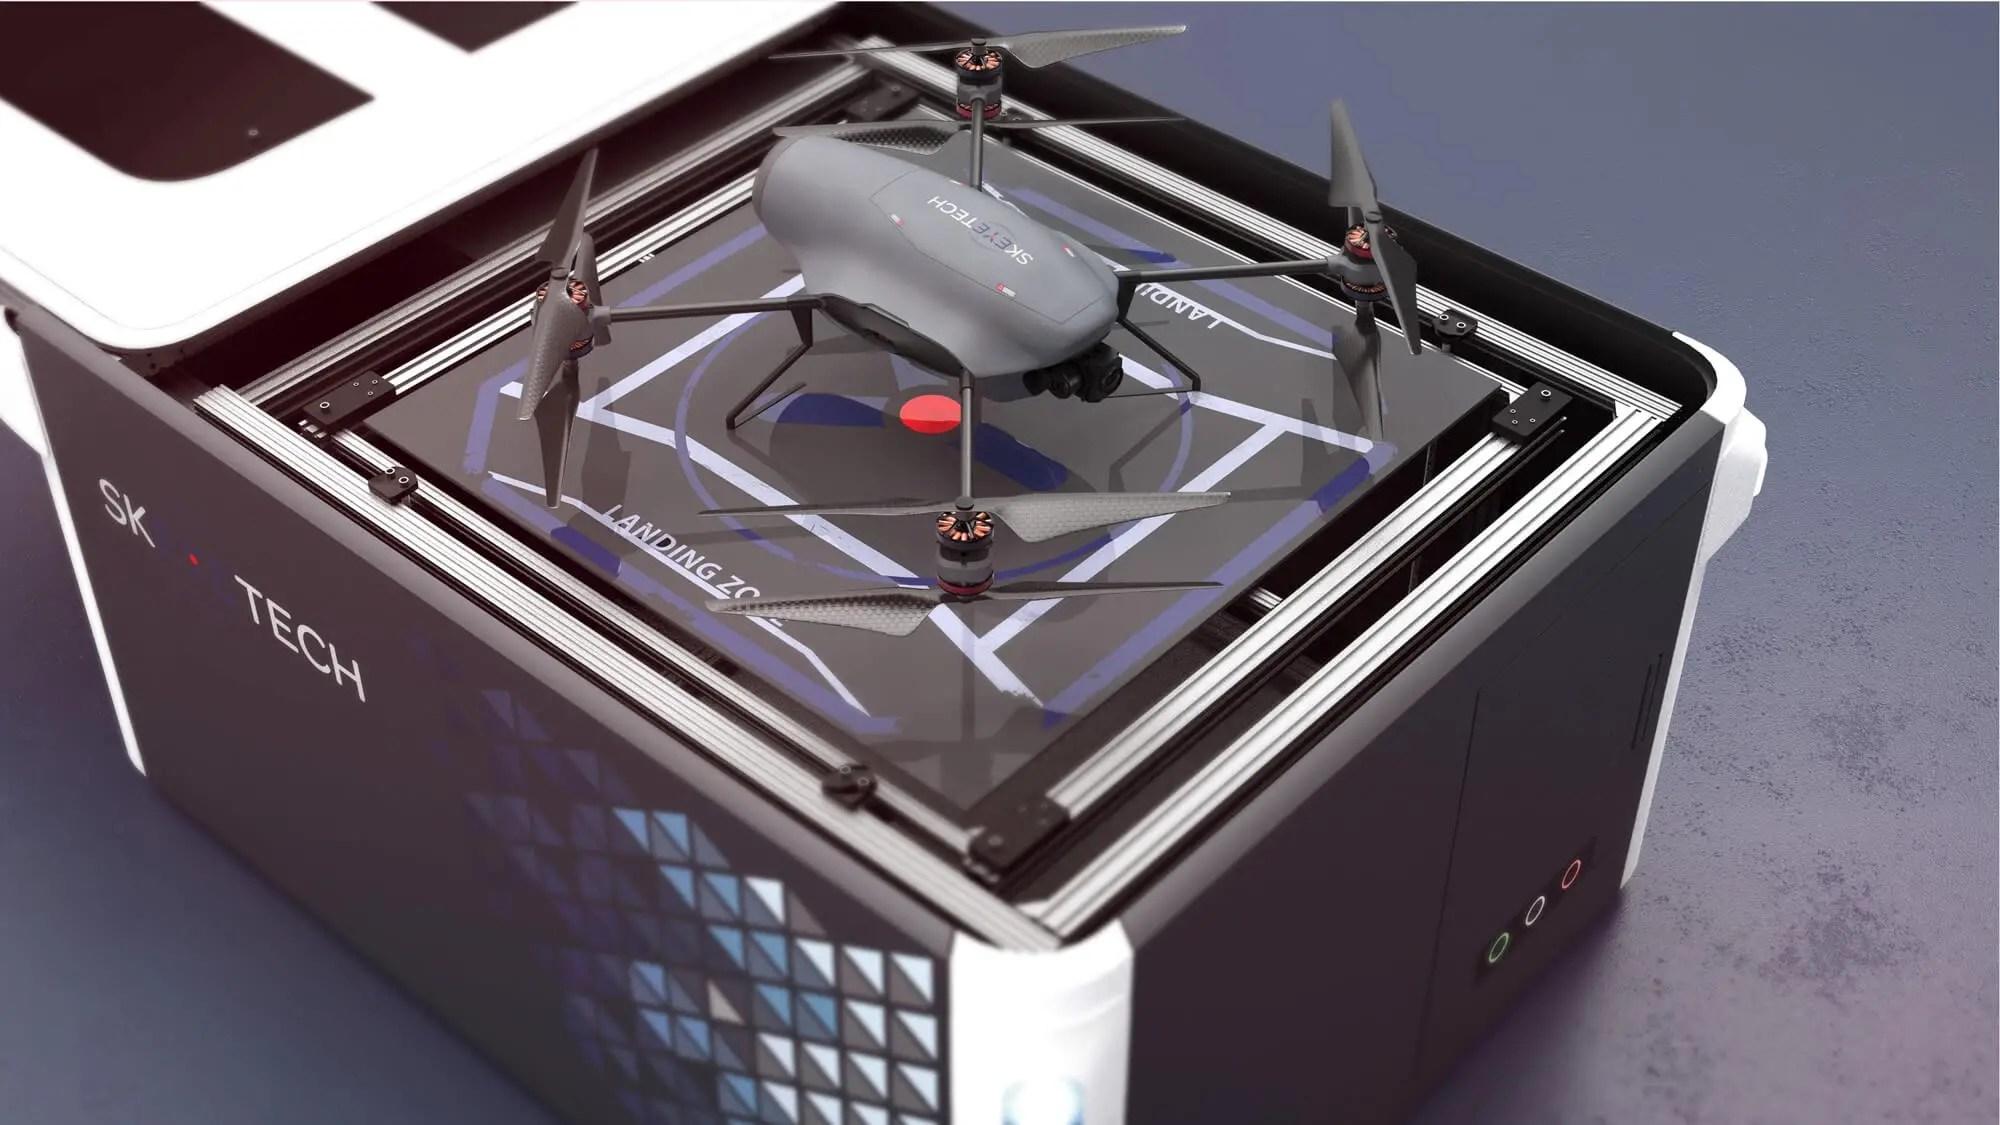 Skeyetech autonomous drones make industry safer - sUAS News - The Business of Drones